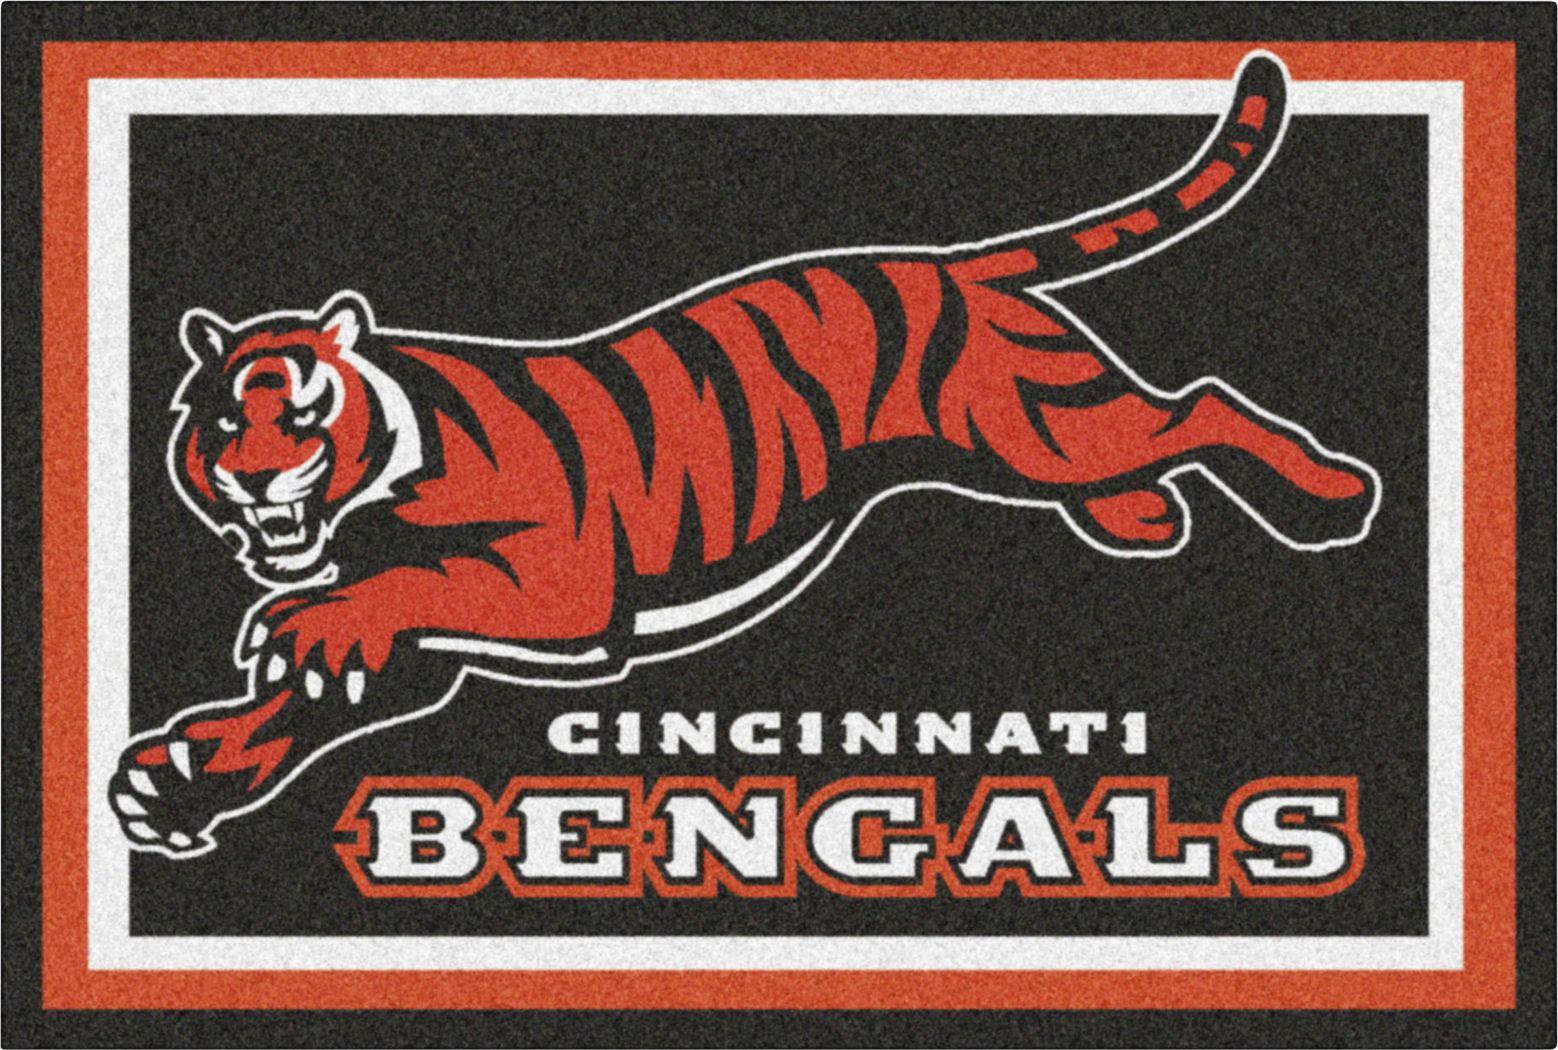 NFL Big Game Cincinnati Bengals 5' x 8' Rug